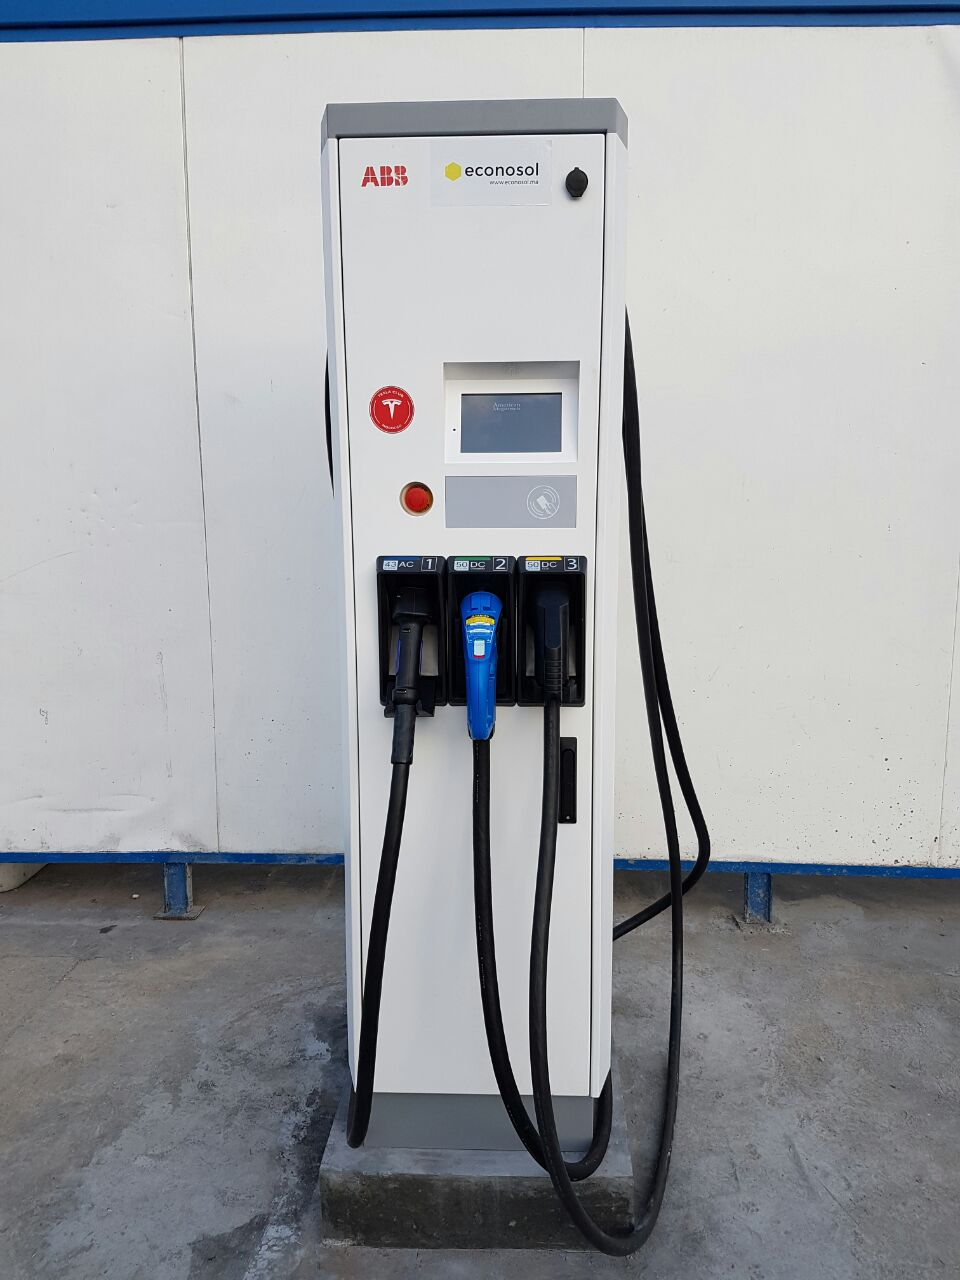 borne de recharge rapide 50kW